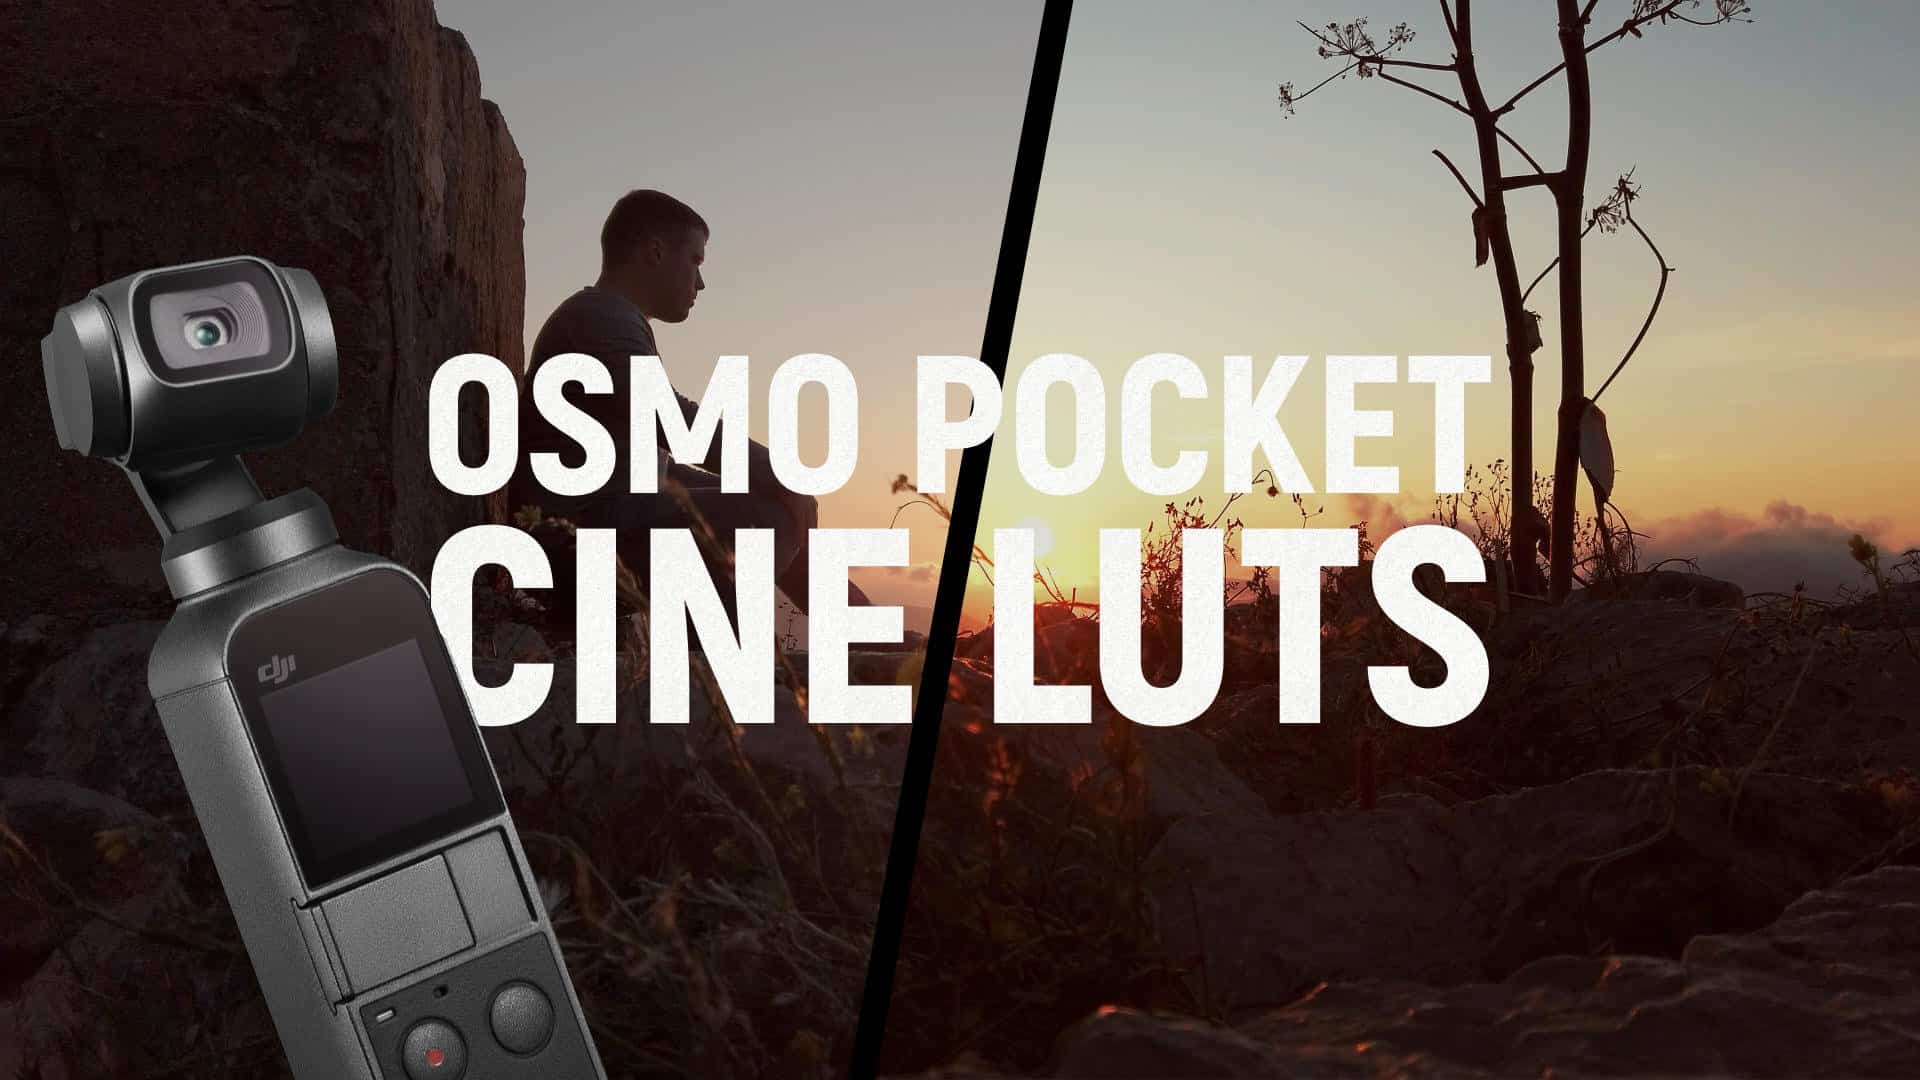 Osmo Pocket Cine LUTs